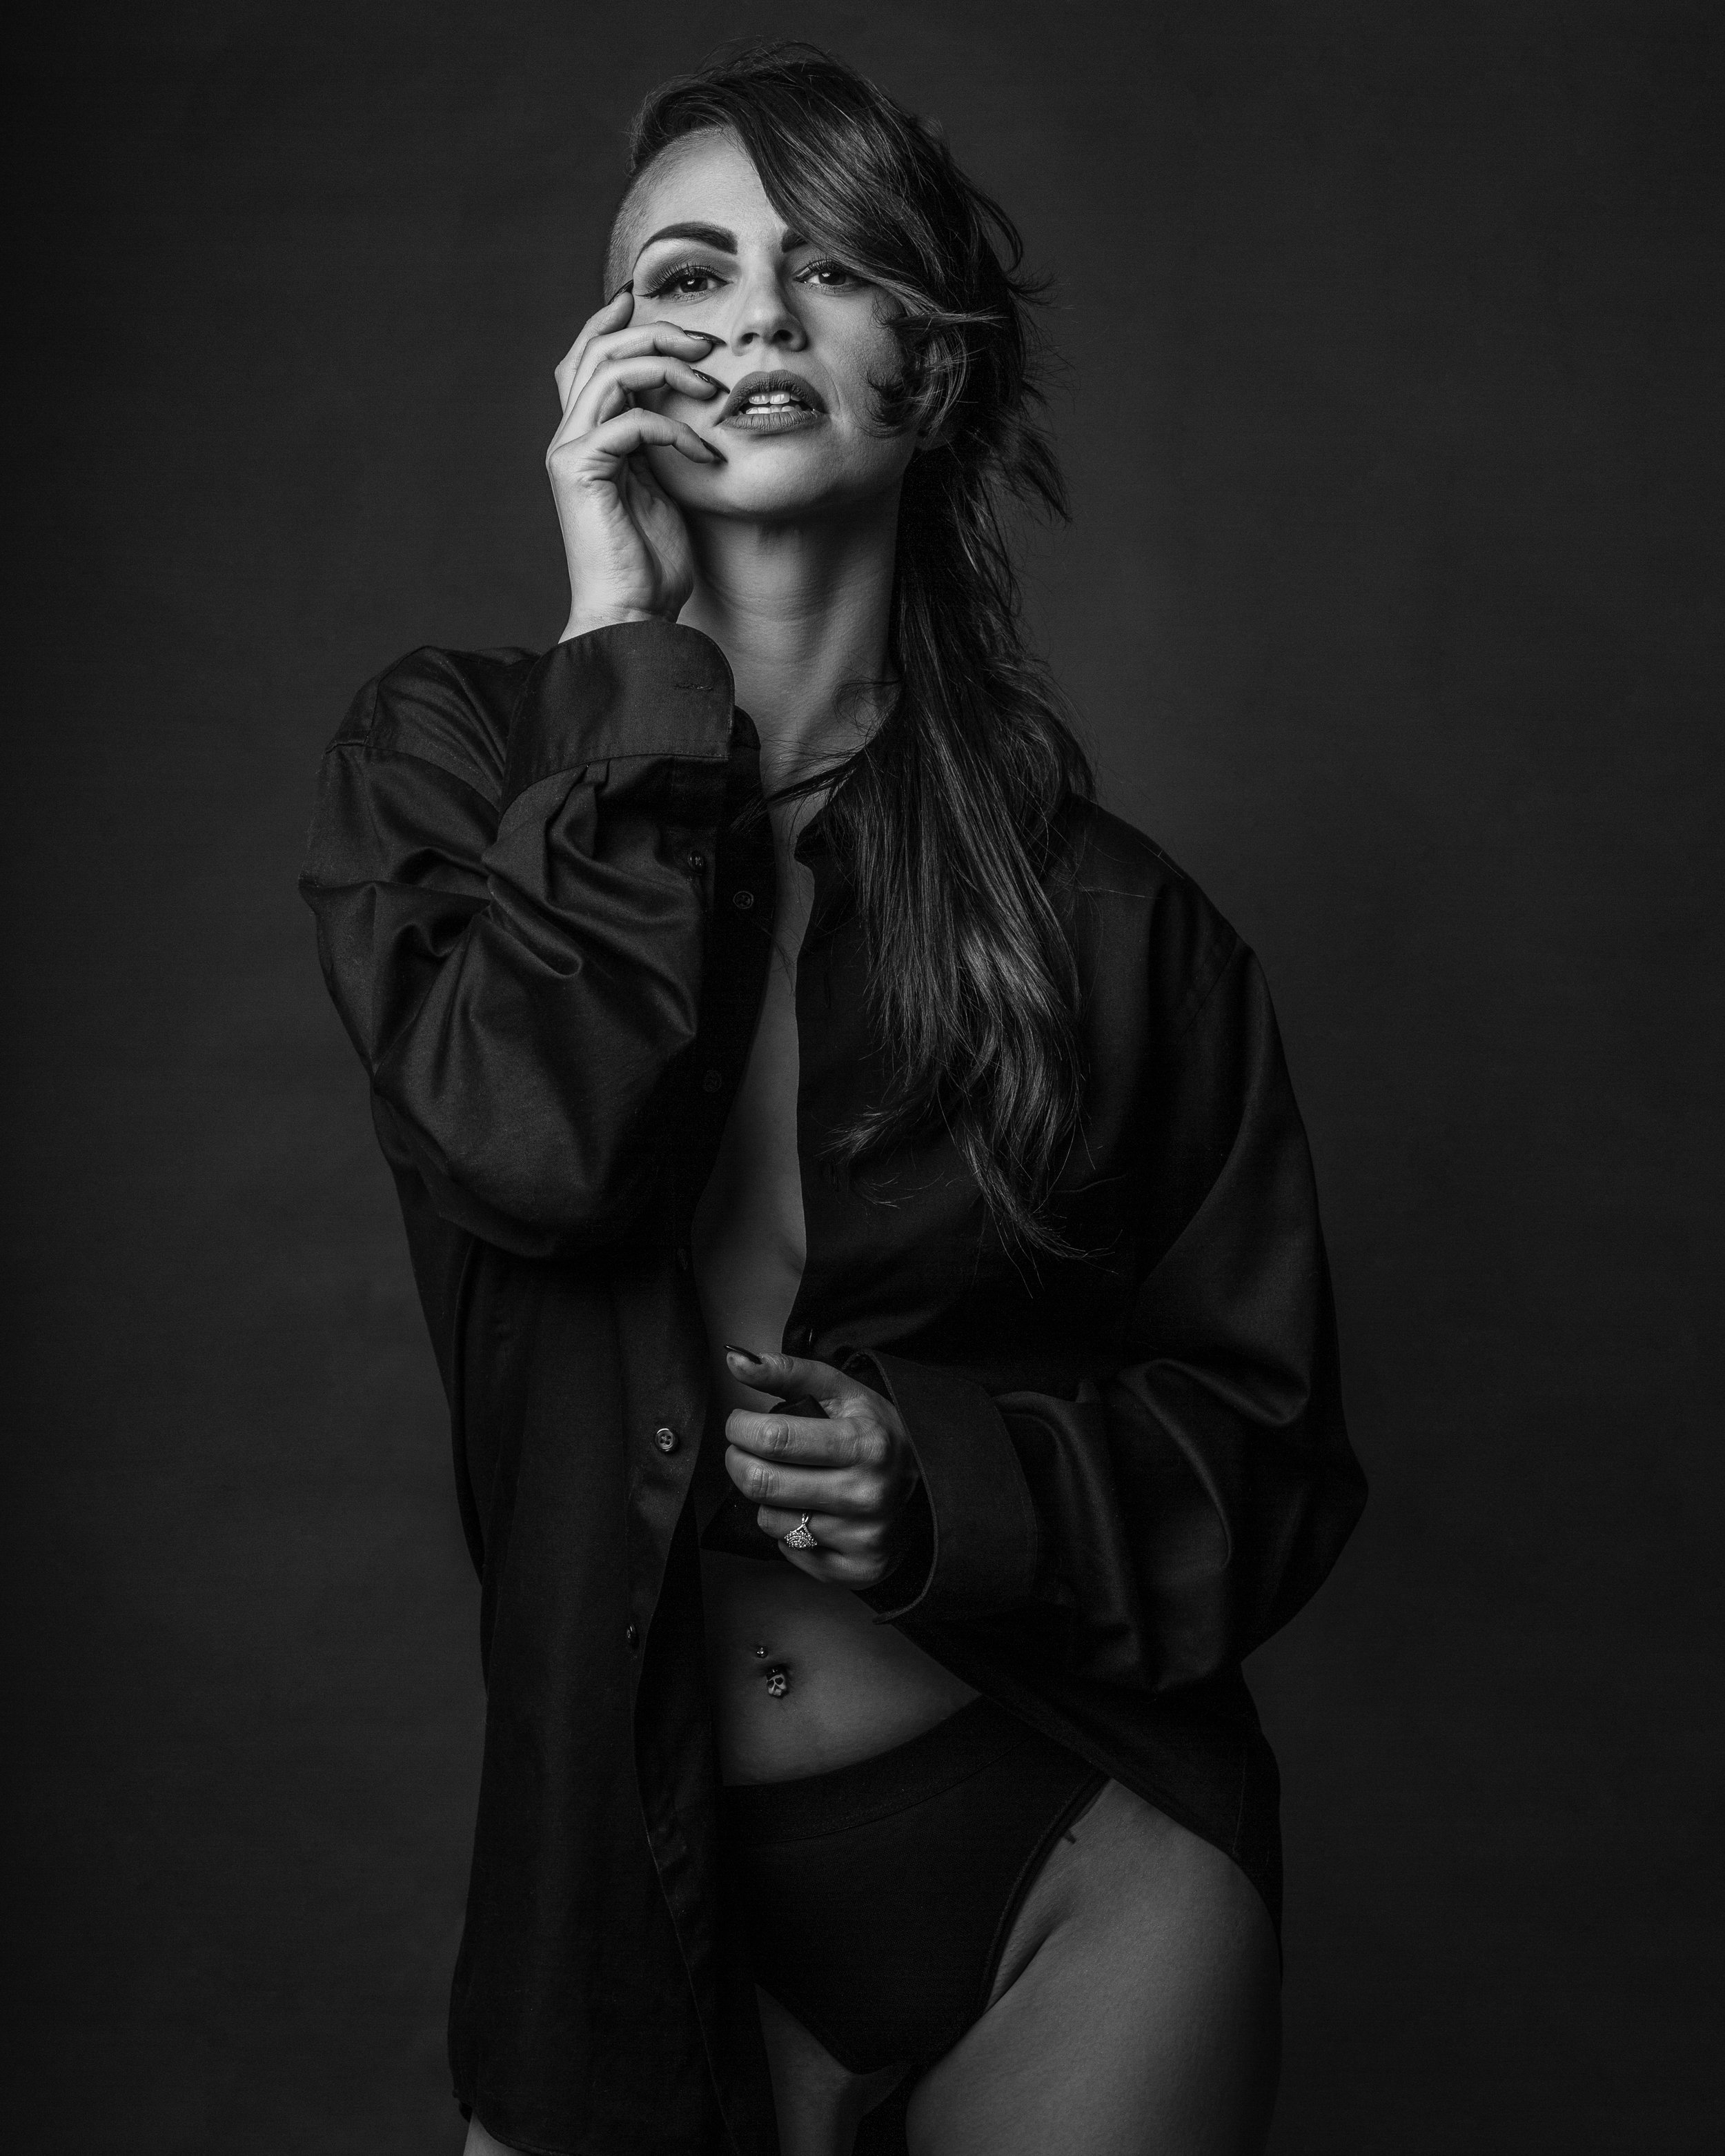 Portrait-PhotosJPG